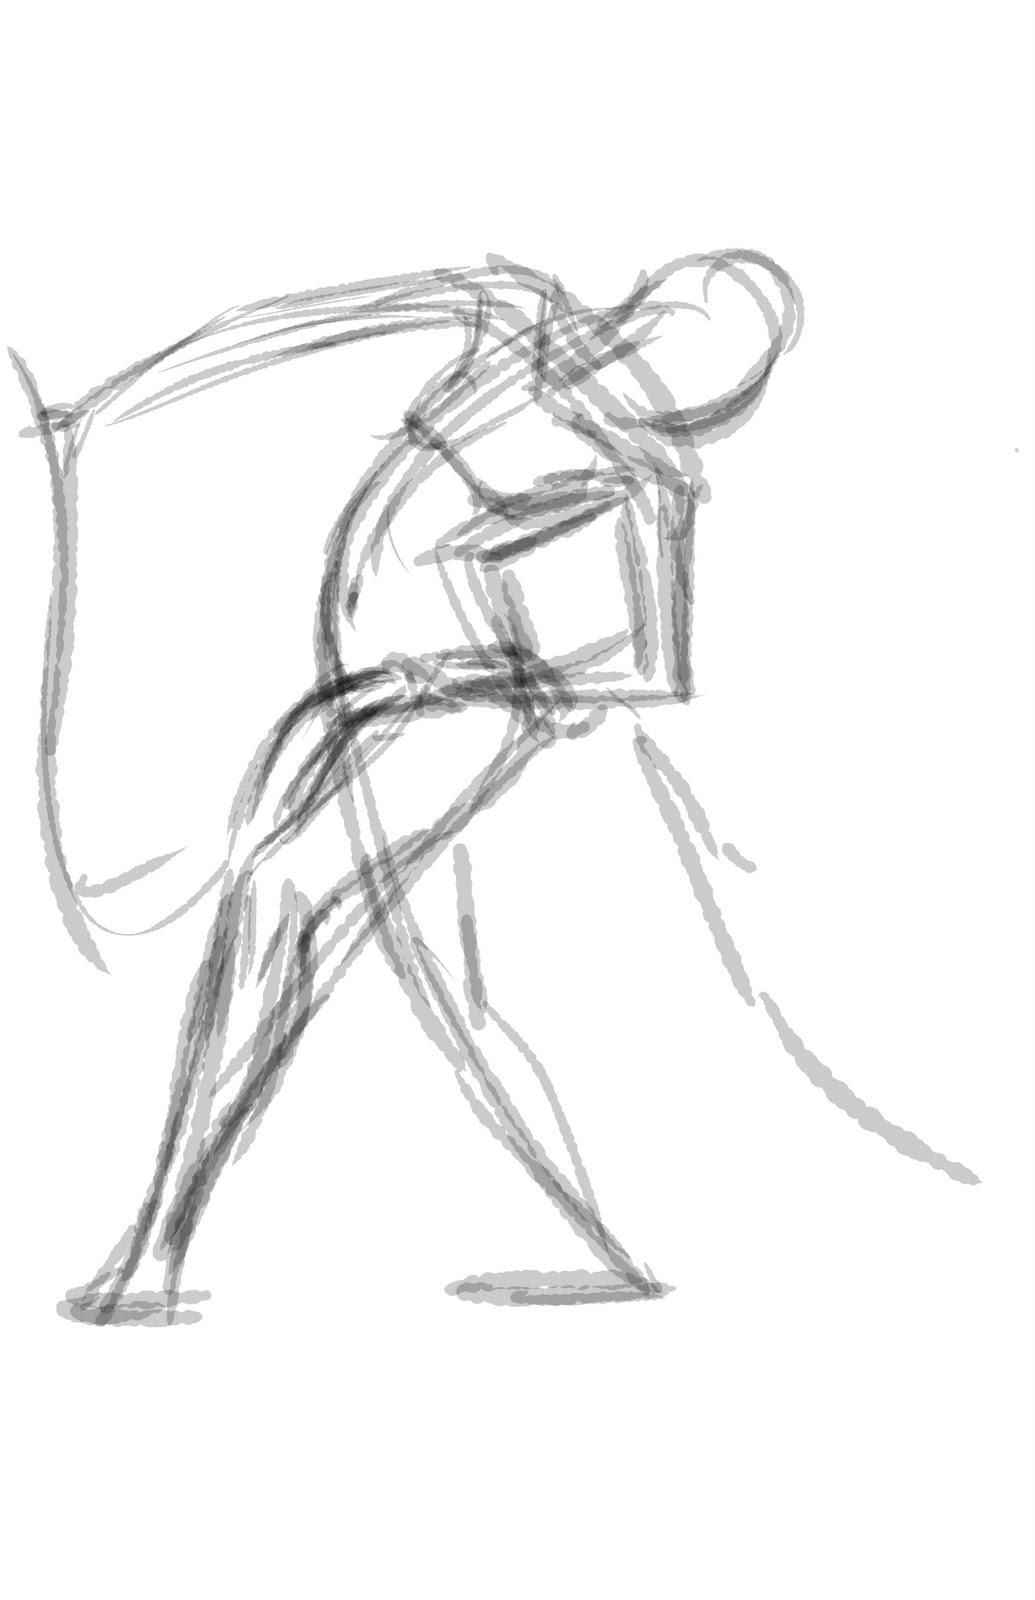 Joshua Taback Art Blog: Figure & Gesture Drawing Tool